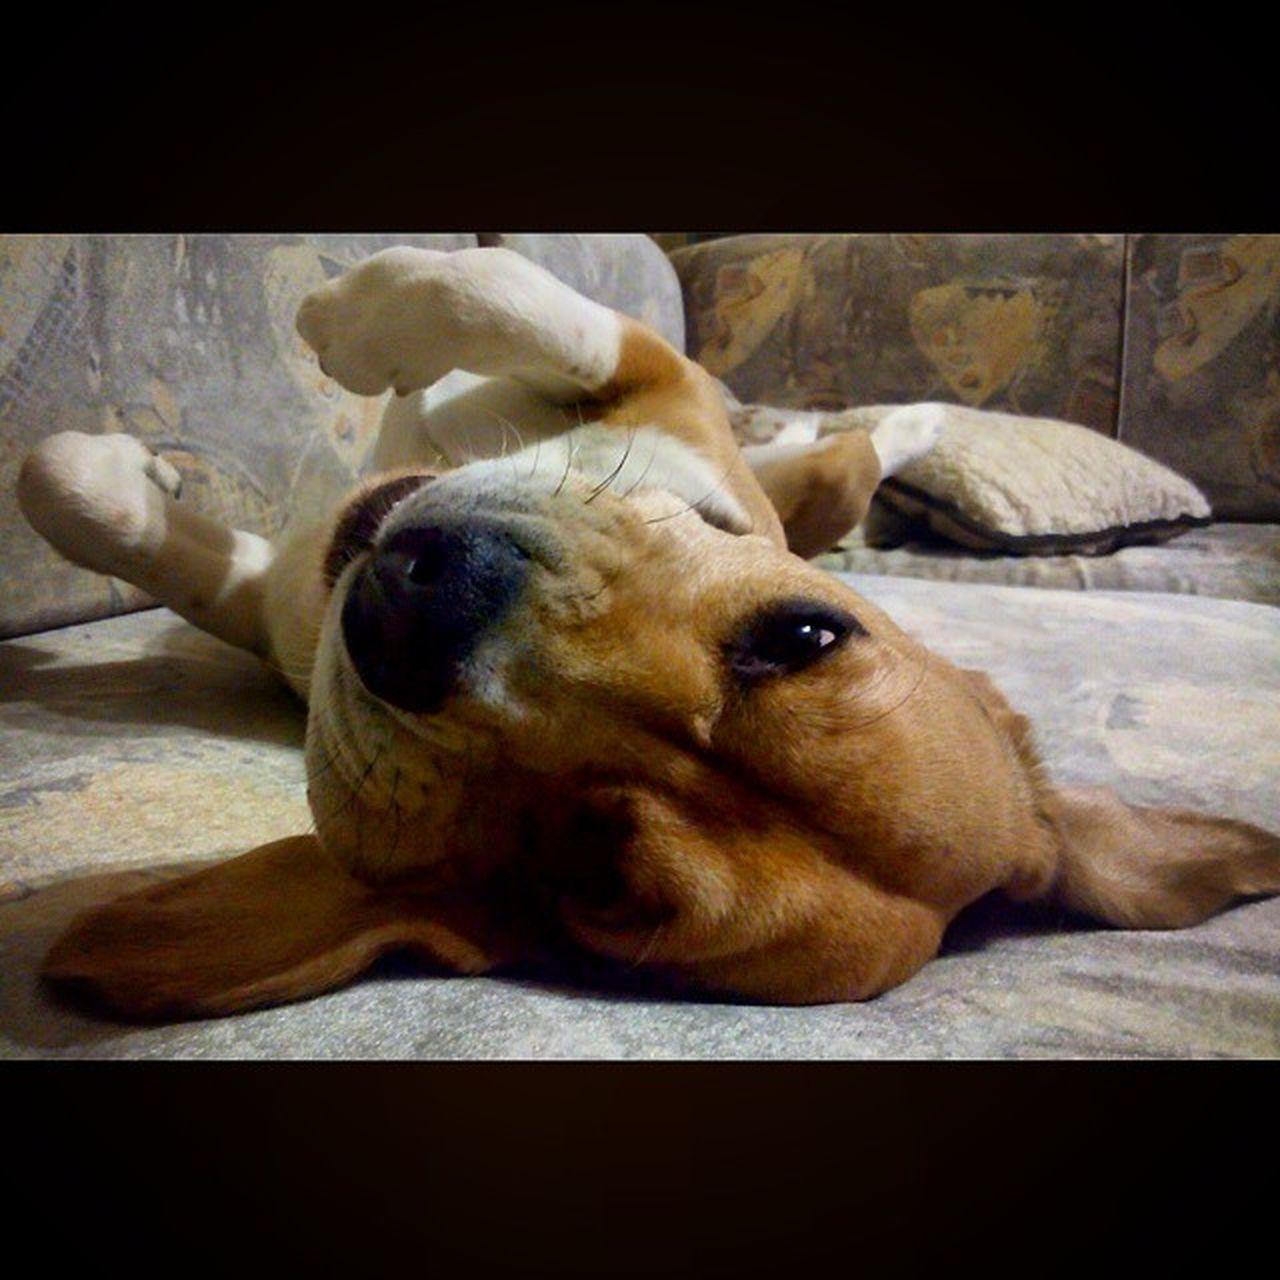 Beagle Beaglelove Dog Zseton Zsetont kidőlt 😁